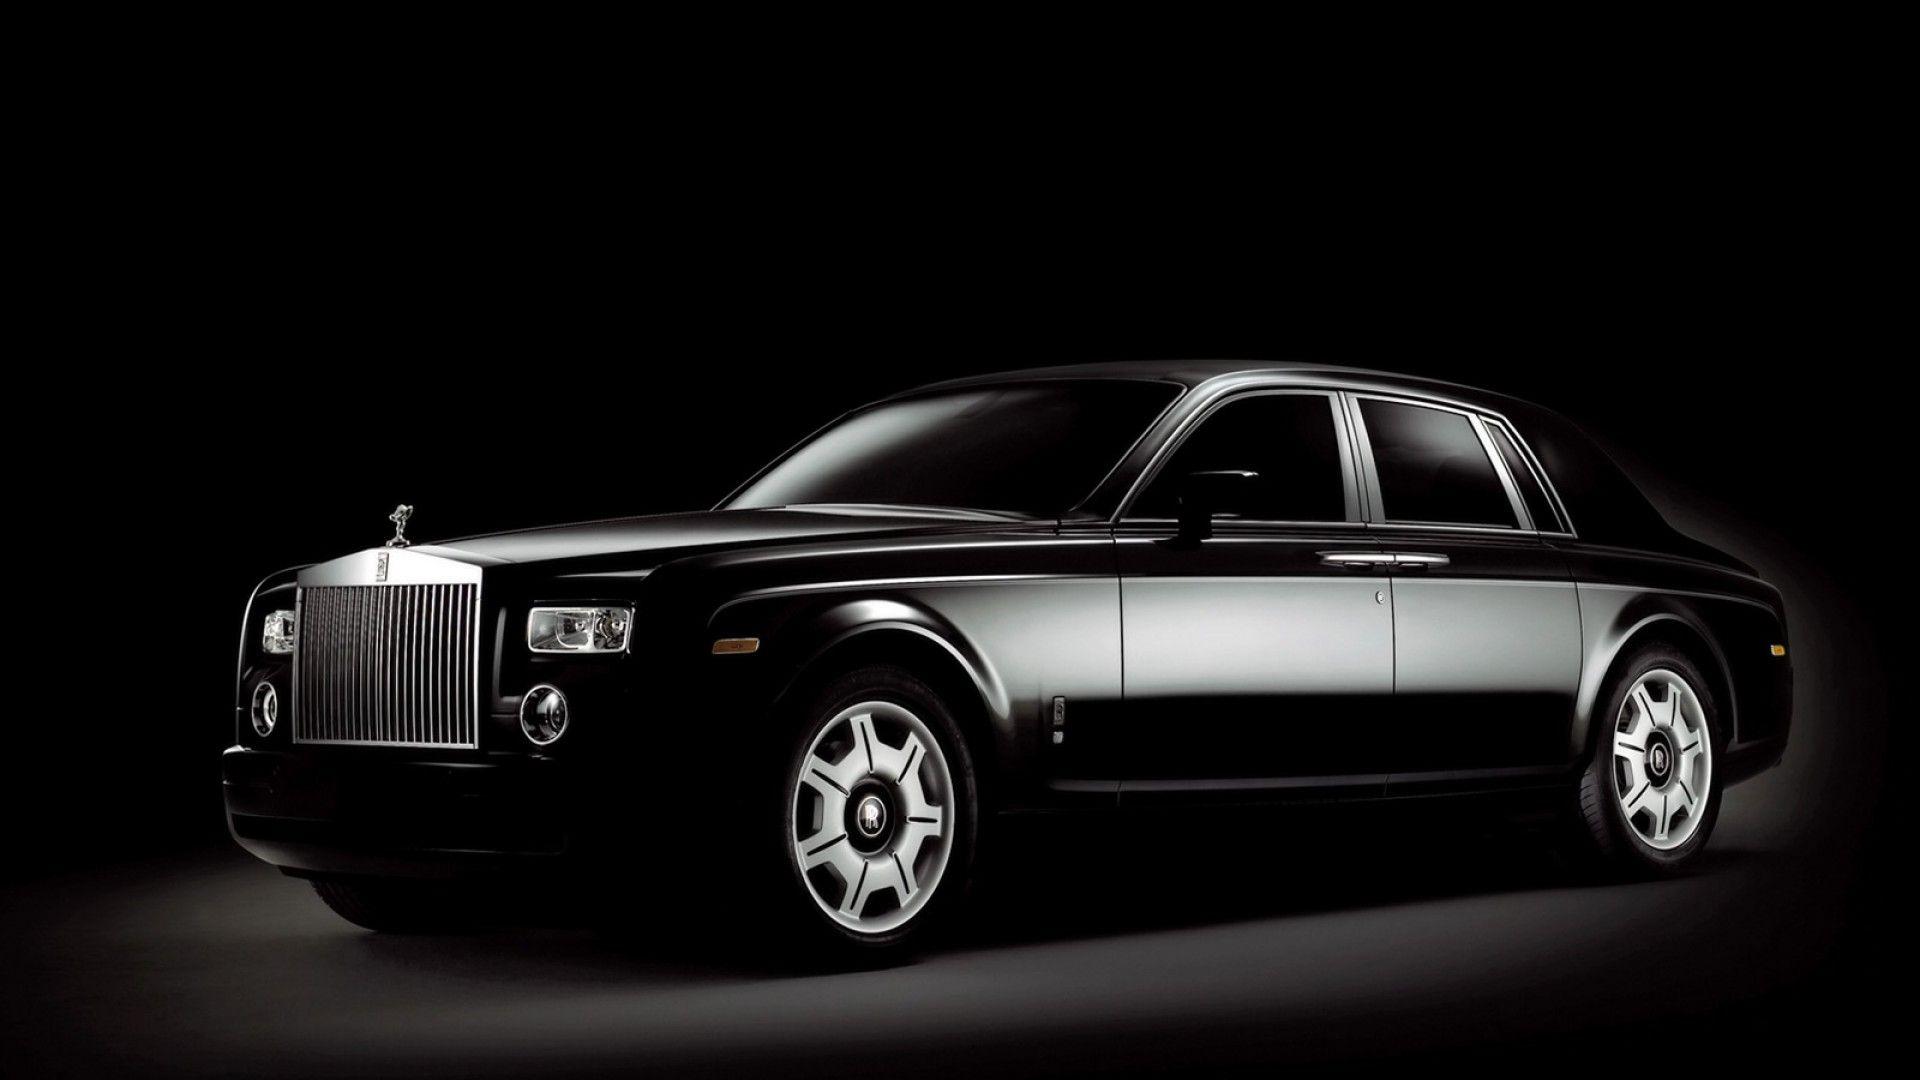 Rolls Royce Phantom Black Hd Wallpapers Cars Rolls Royce